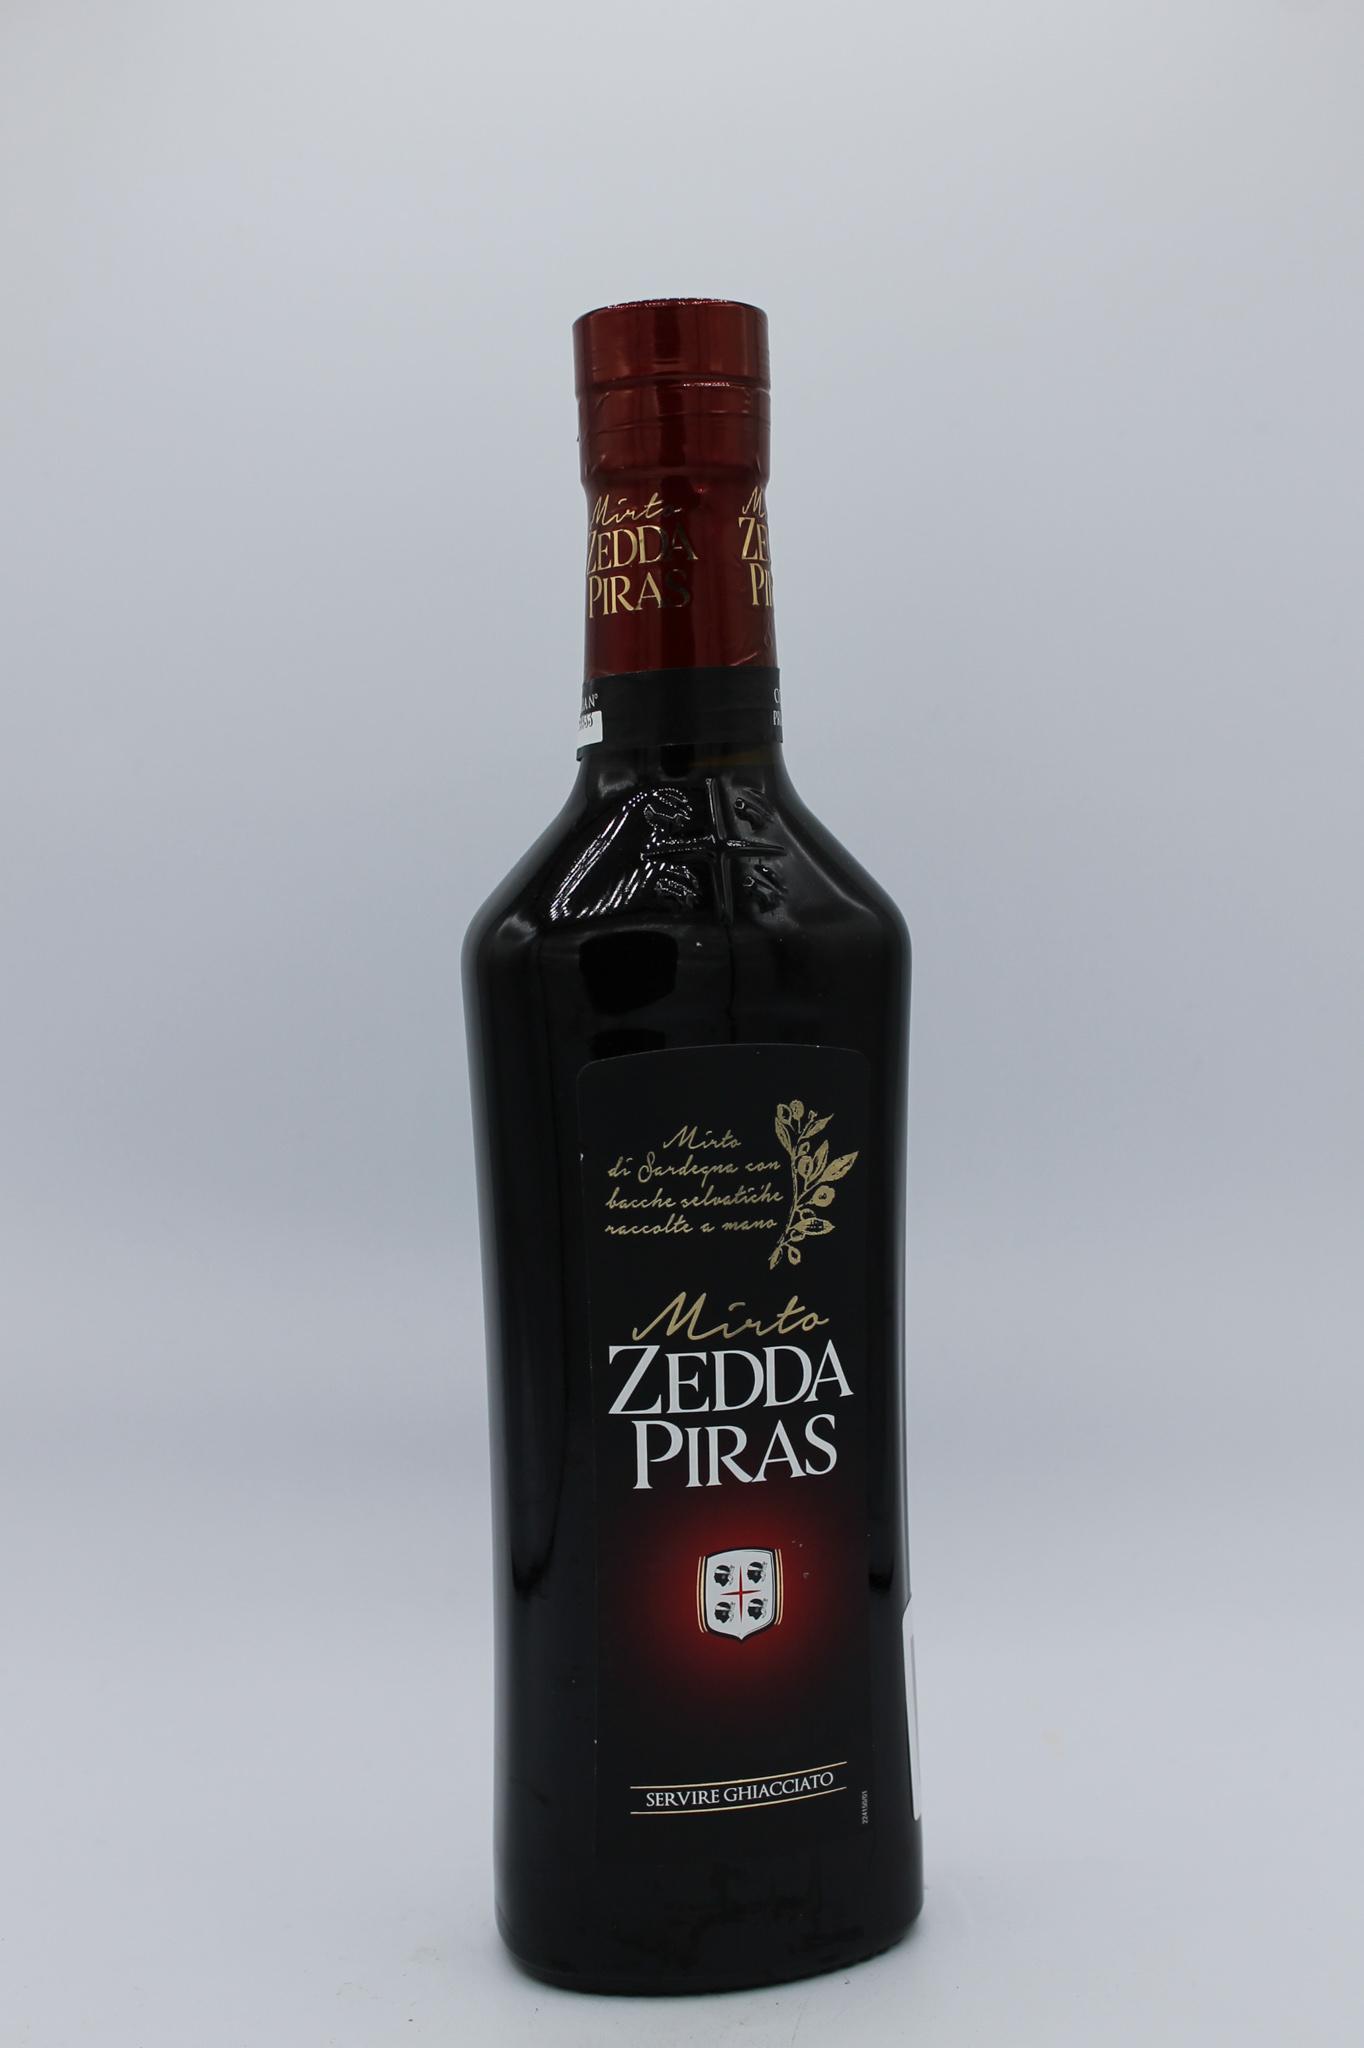 Zedda Piras mirto rosso 500ml.